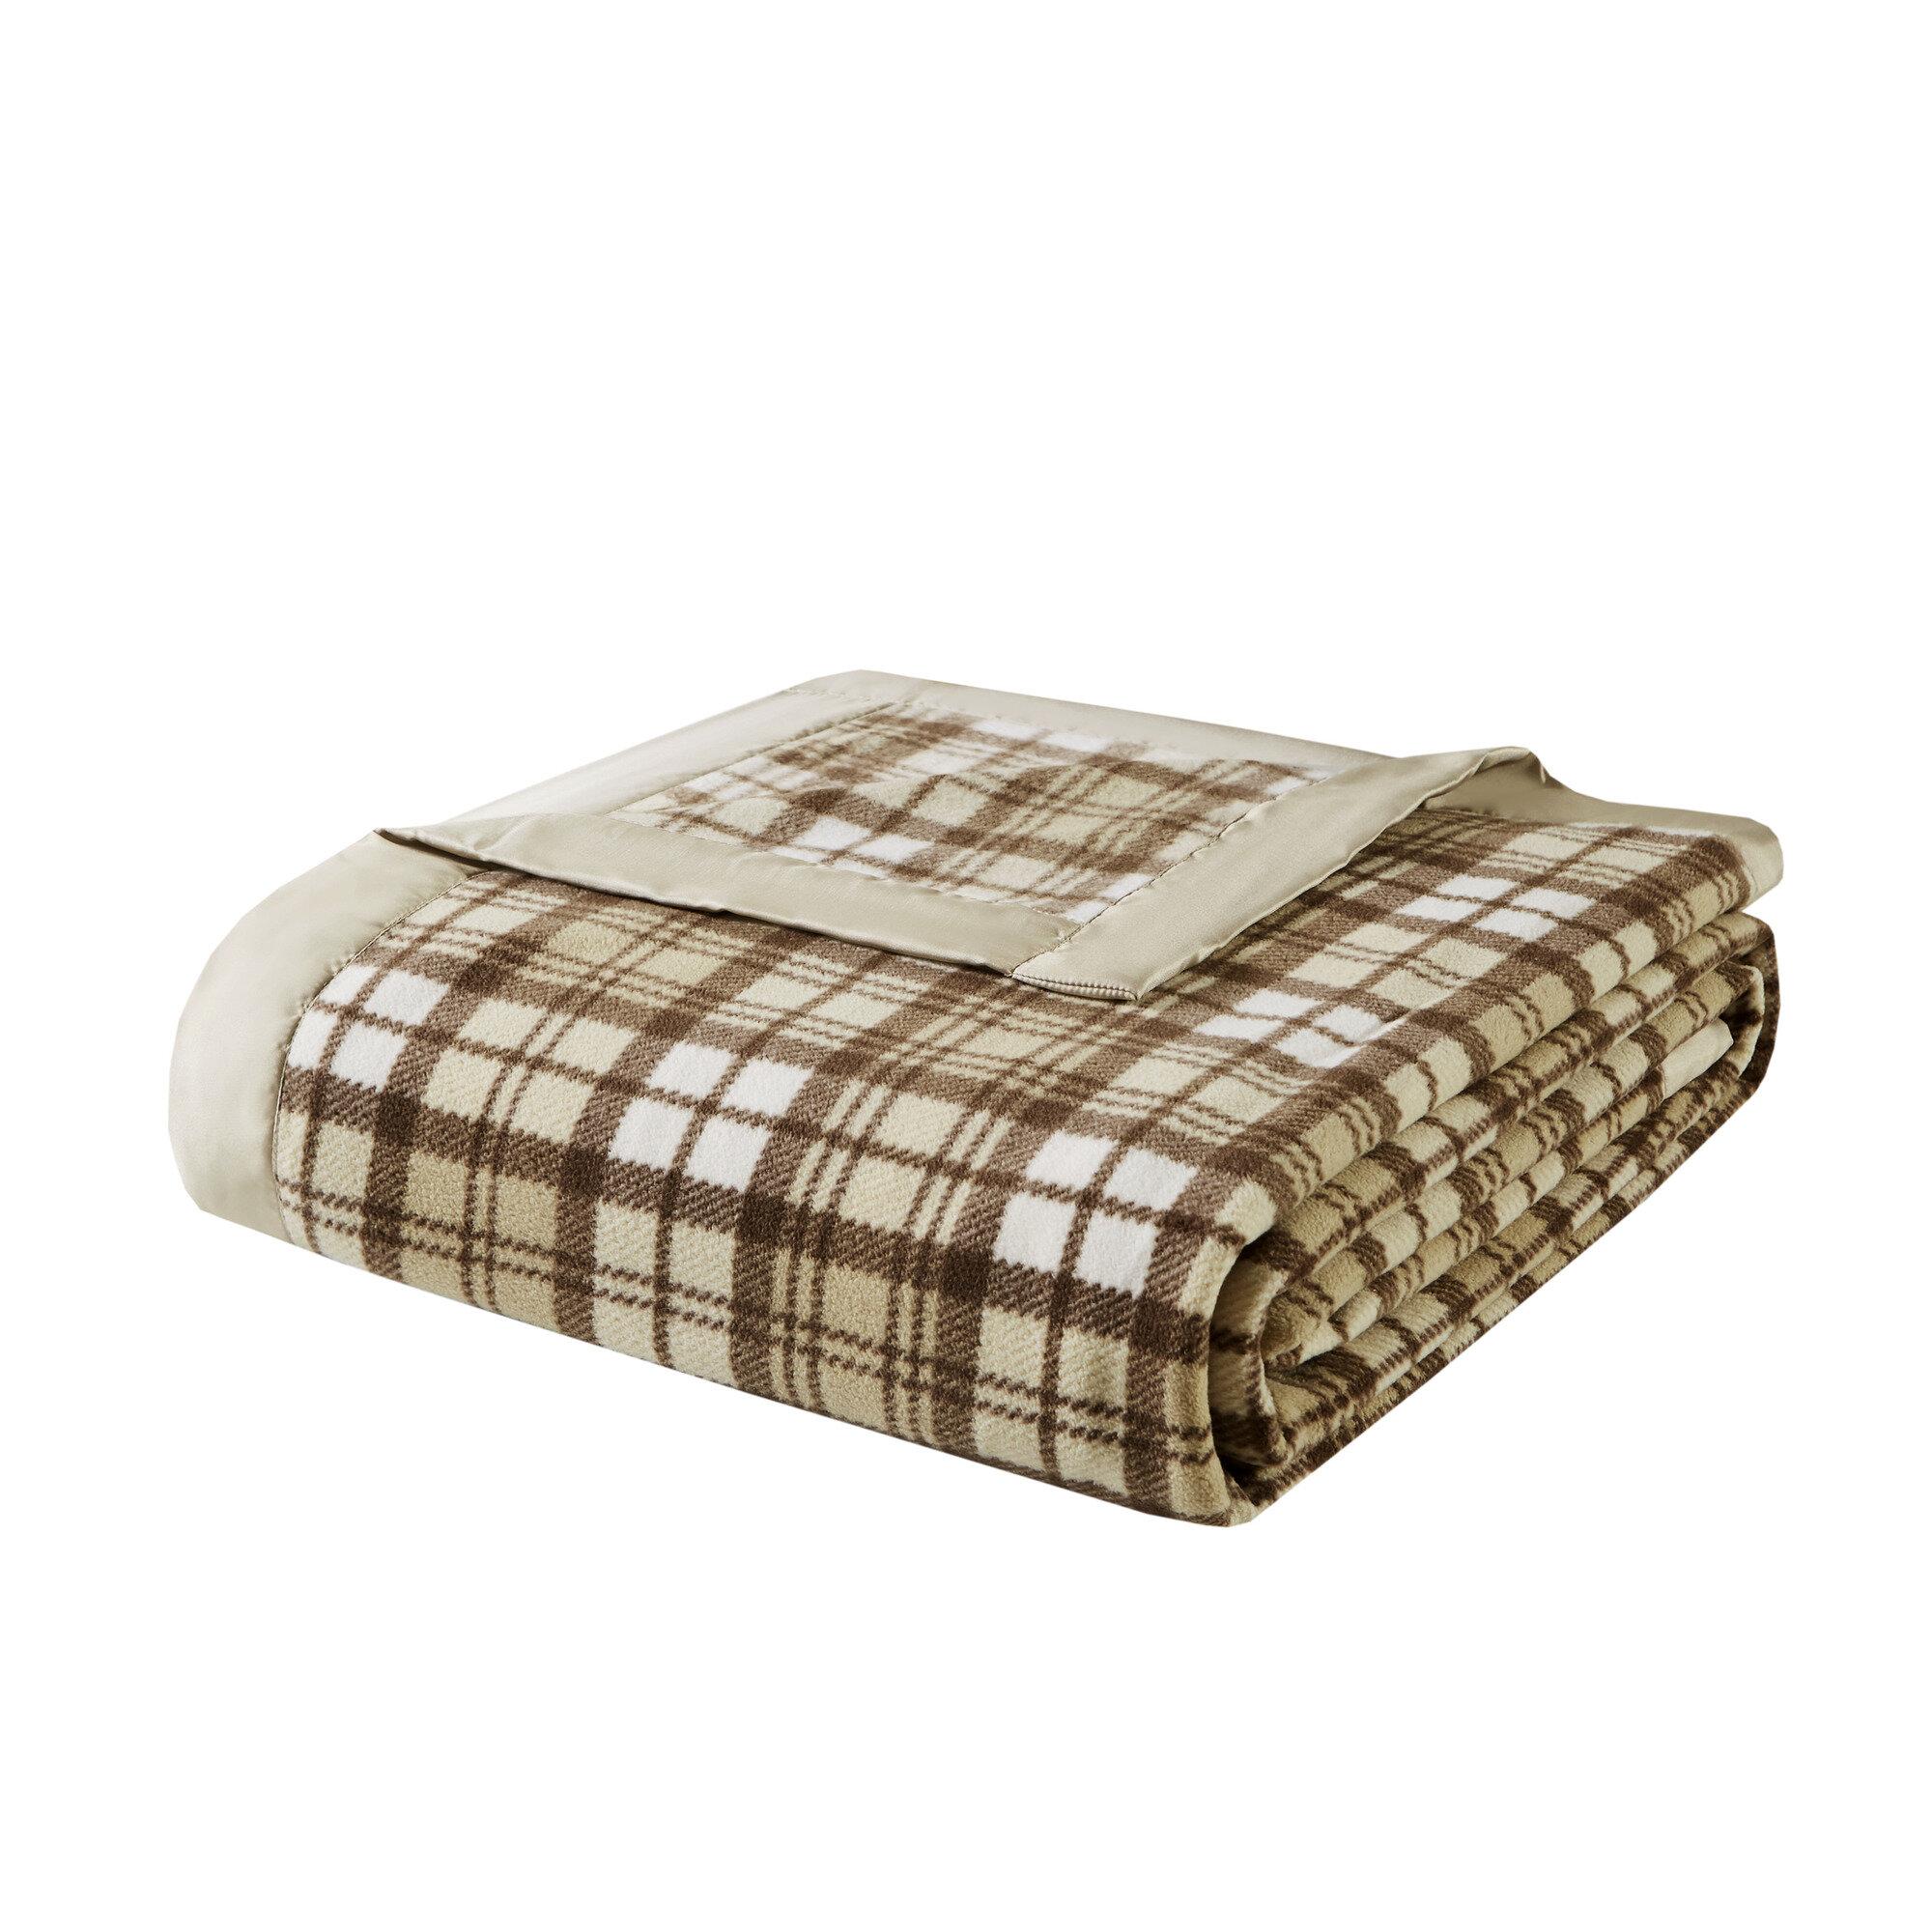 Charlton Home Abingdon Micro Fleece Blanket Reviews Wayfair